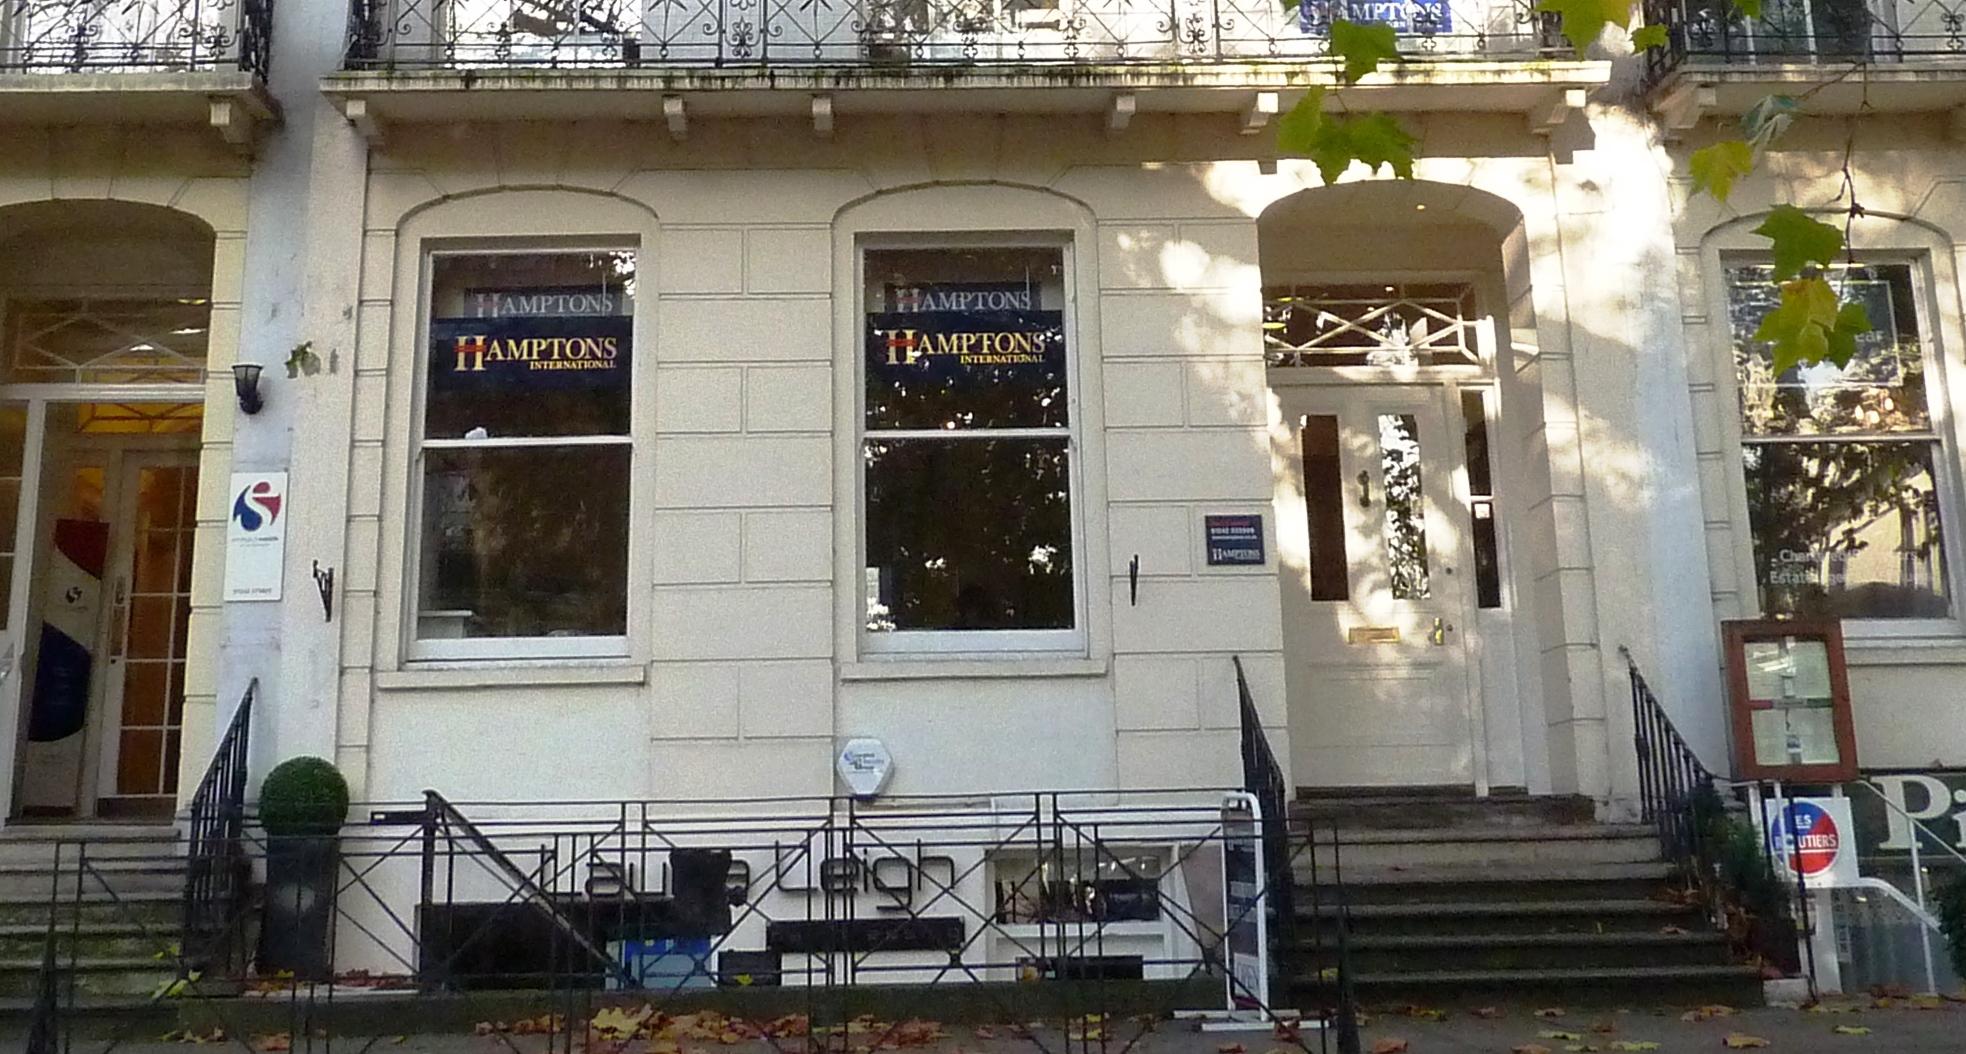 Hamptons International Estate Agents Cheltenham